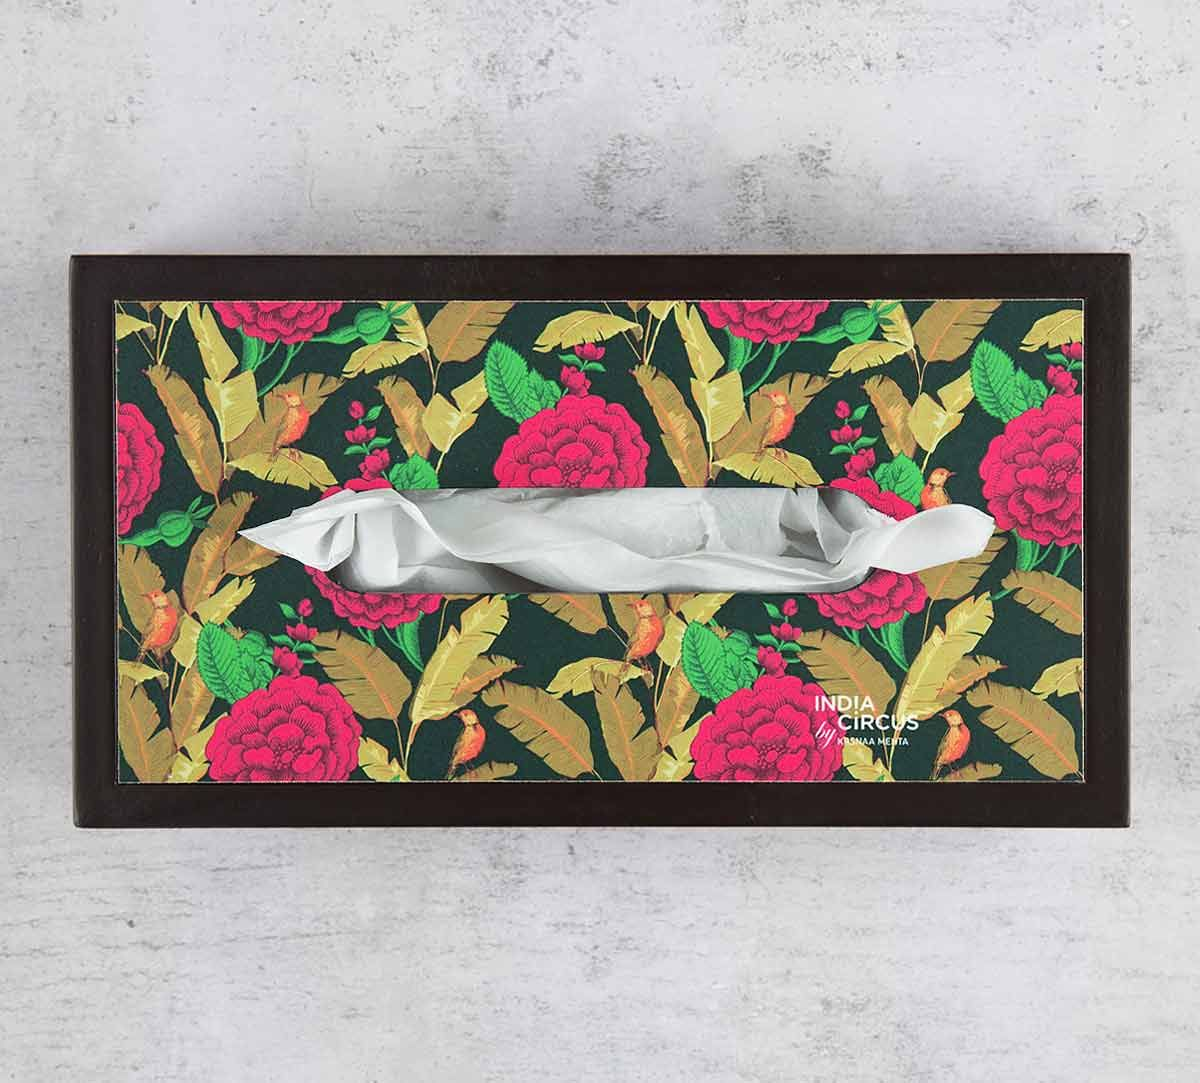 India Circus Bayrose Romance MDF Tissue Box Holder